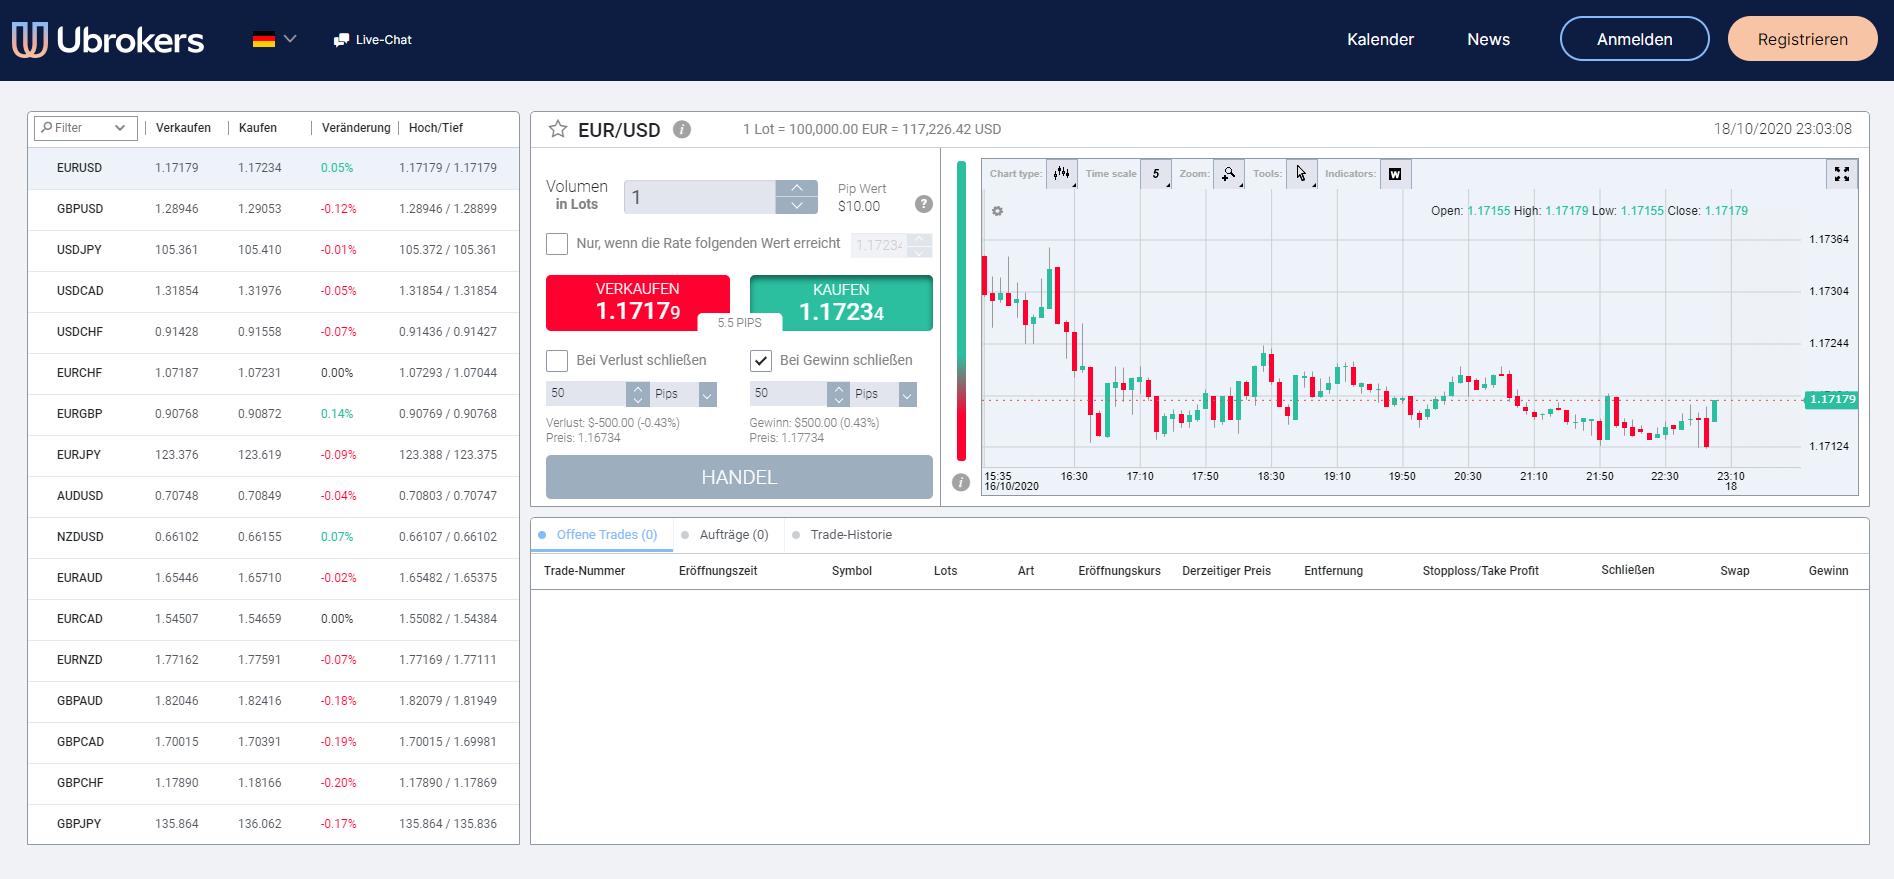 Trading Plattform von Ubrokers